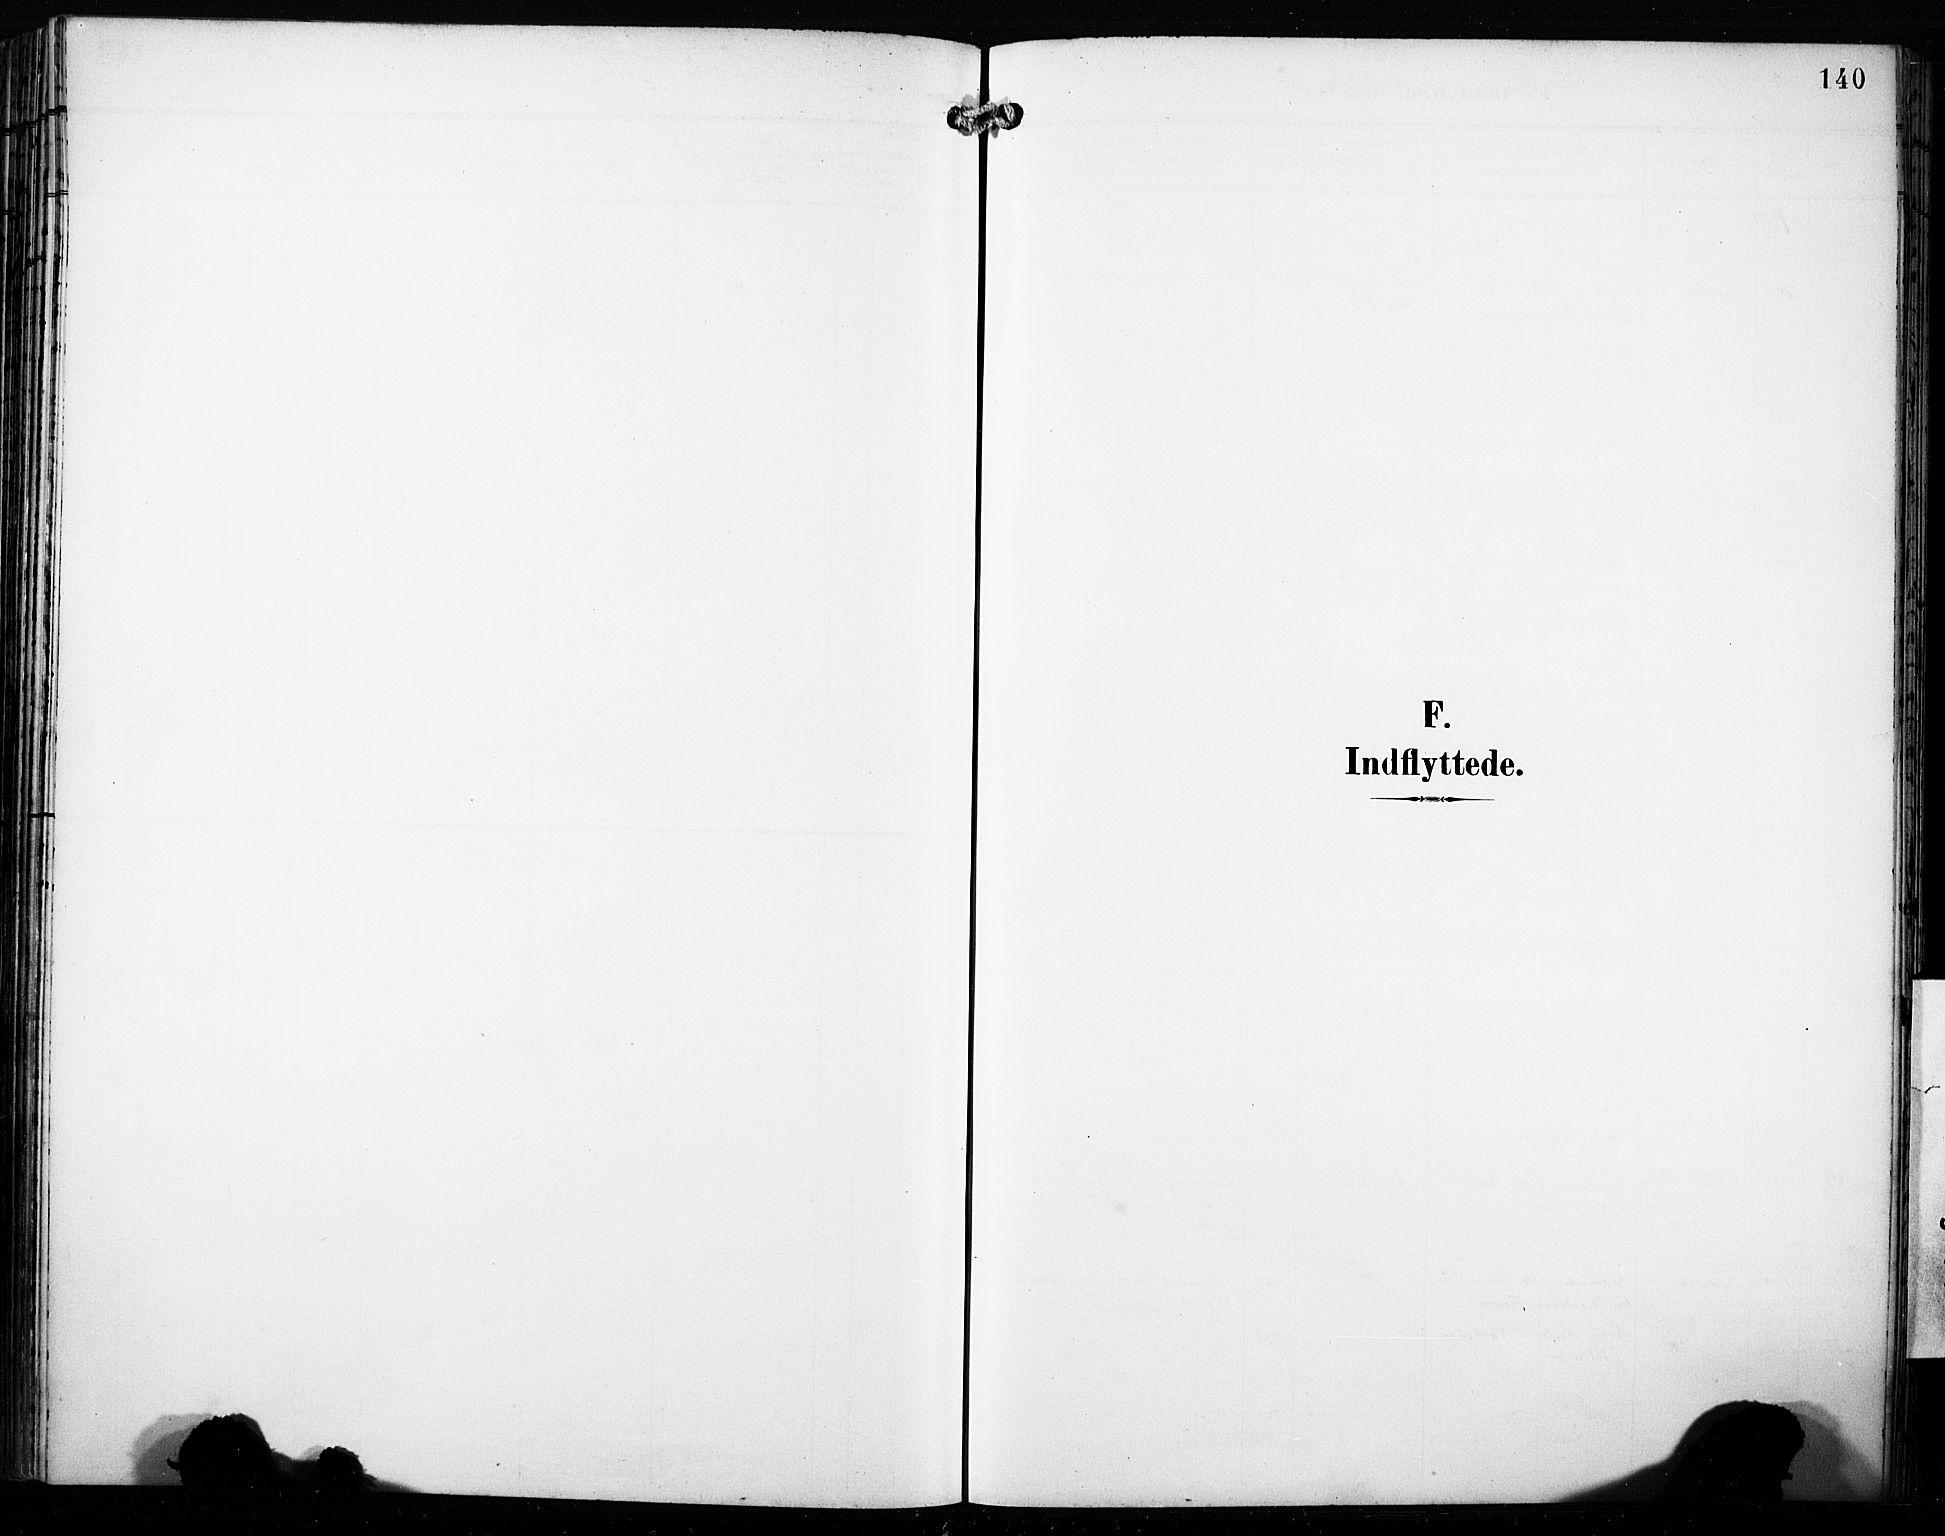 SAB, Fana Sokneprestembete, H/Haa/Haab/L0003: Ministerialbok nr. B 3, 1898-1907, s. 140